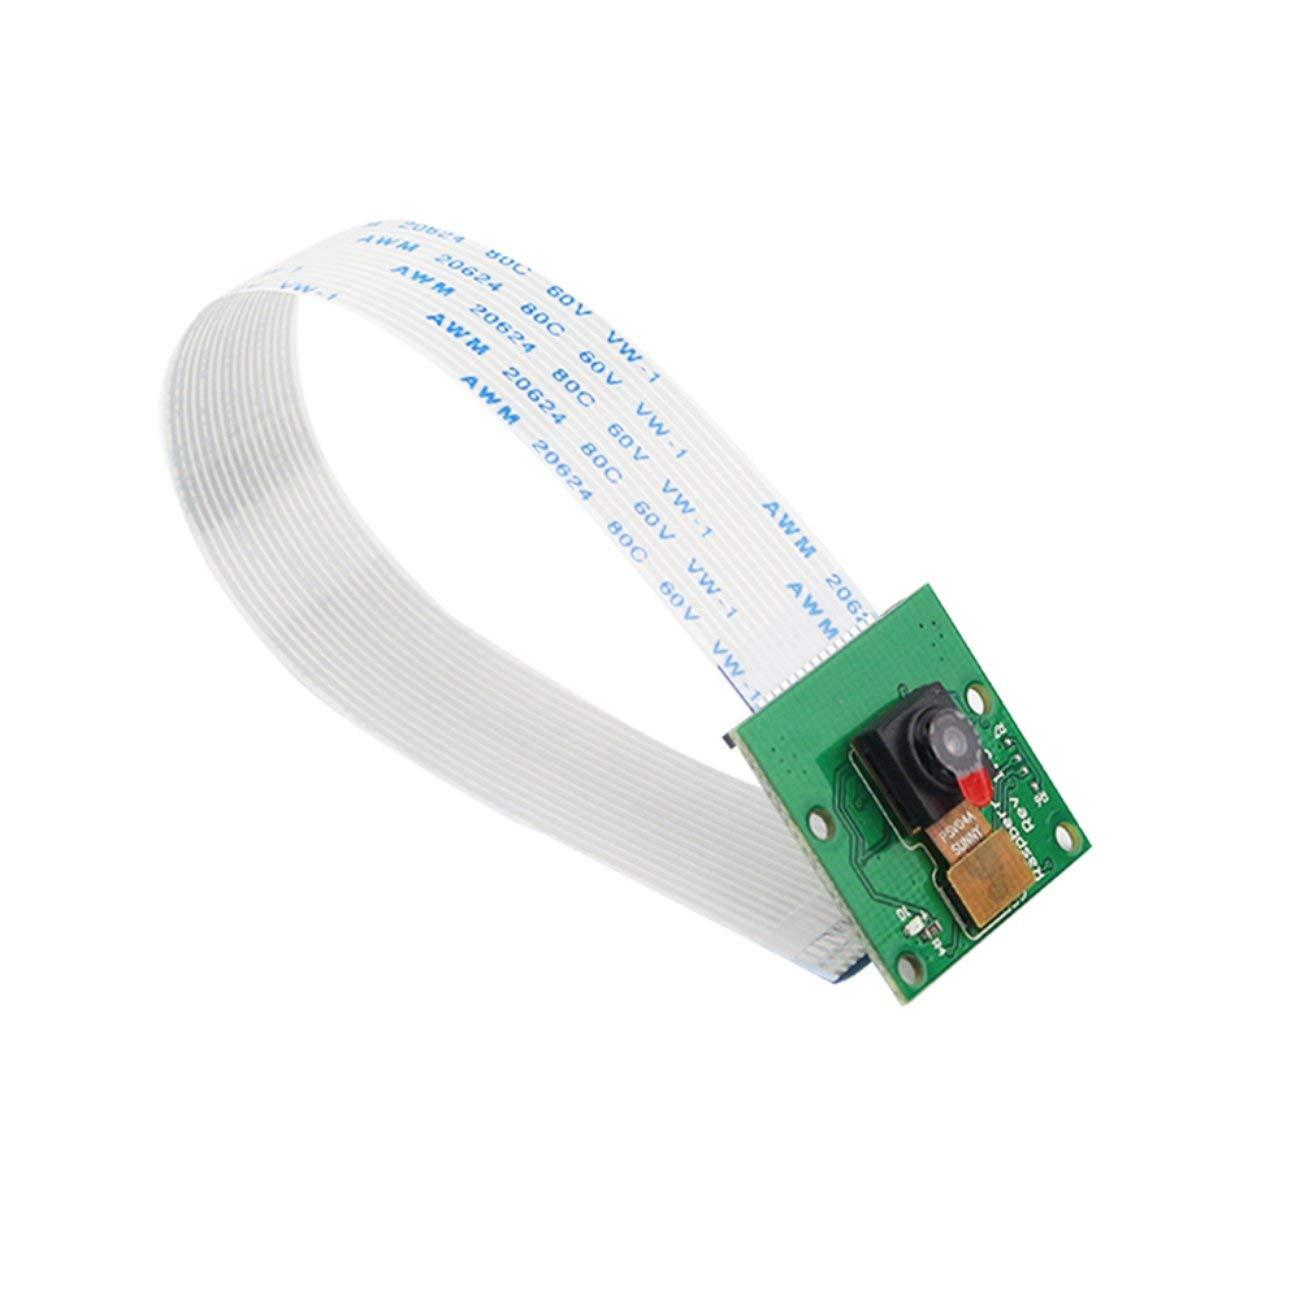 for Raspberry Pi 3 Model B Camera Module 1080p 720p Mini Camera 5MP Webcam Video Camera for Raspberry Pi 2 Model B